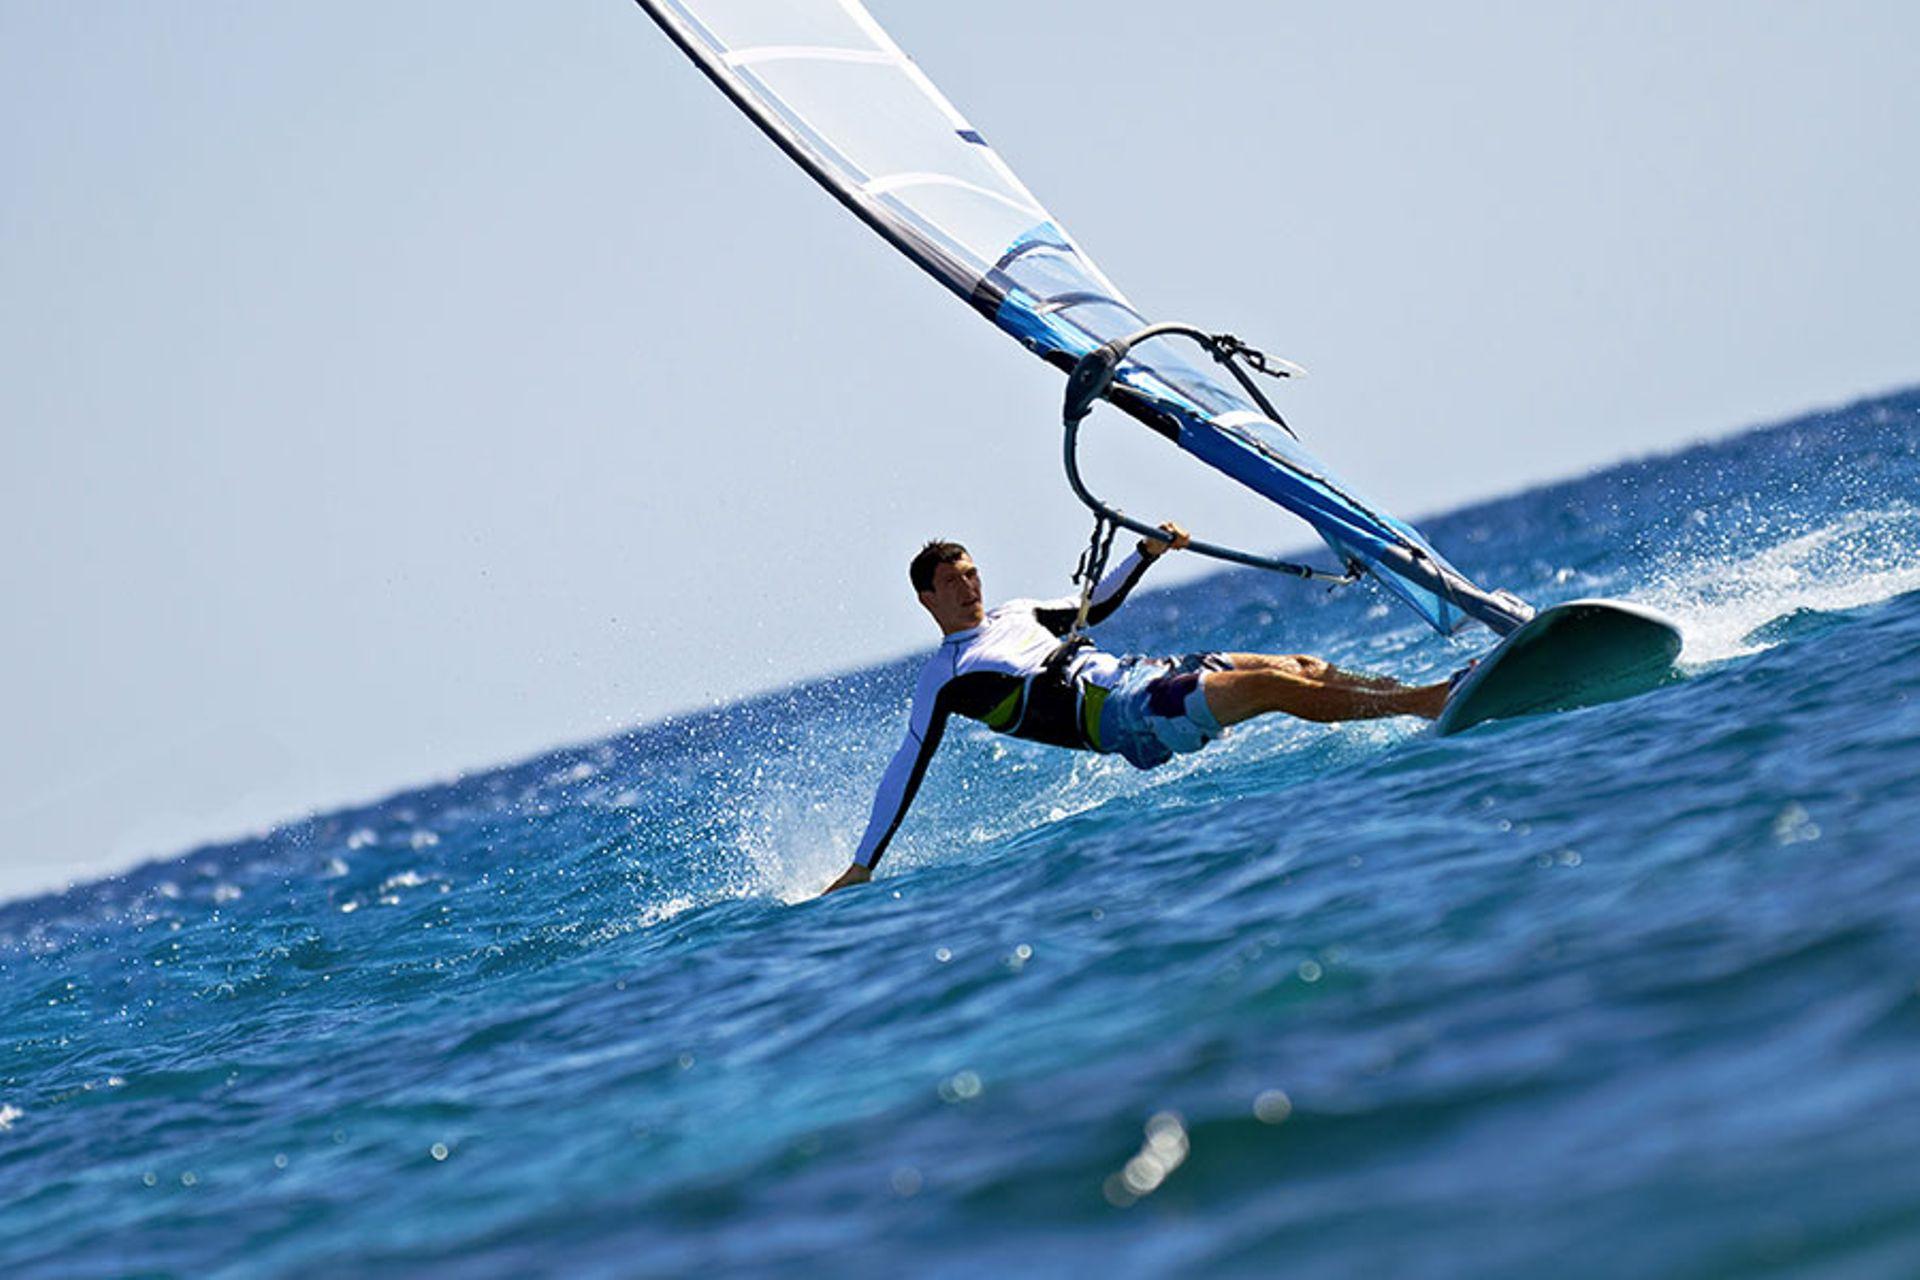 nowboat-activities-windsurf-man-windsurfer-windsurf-board-by-Dima-Fadeev.jpg